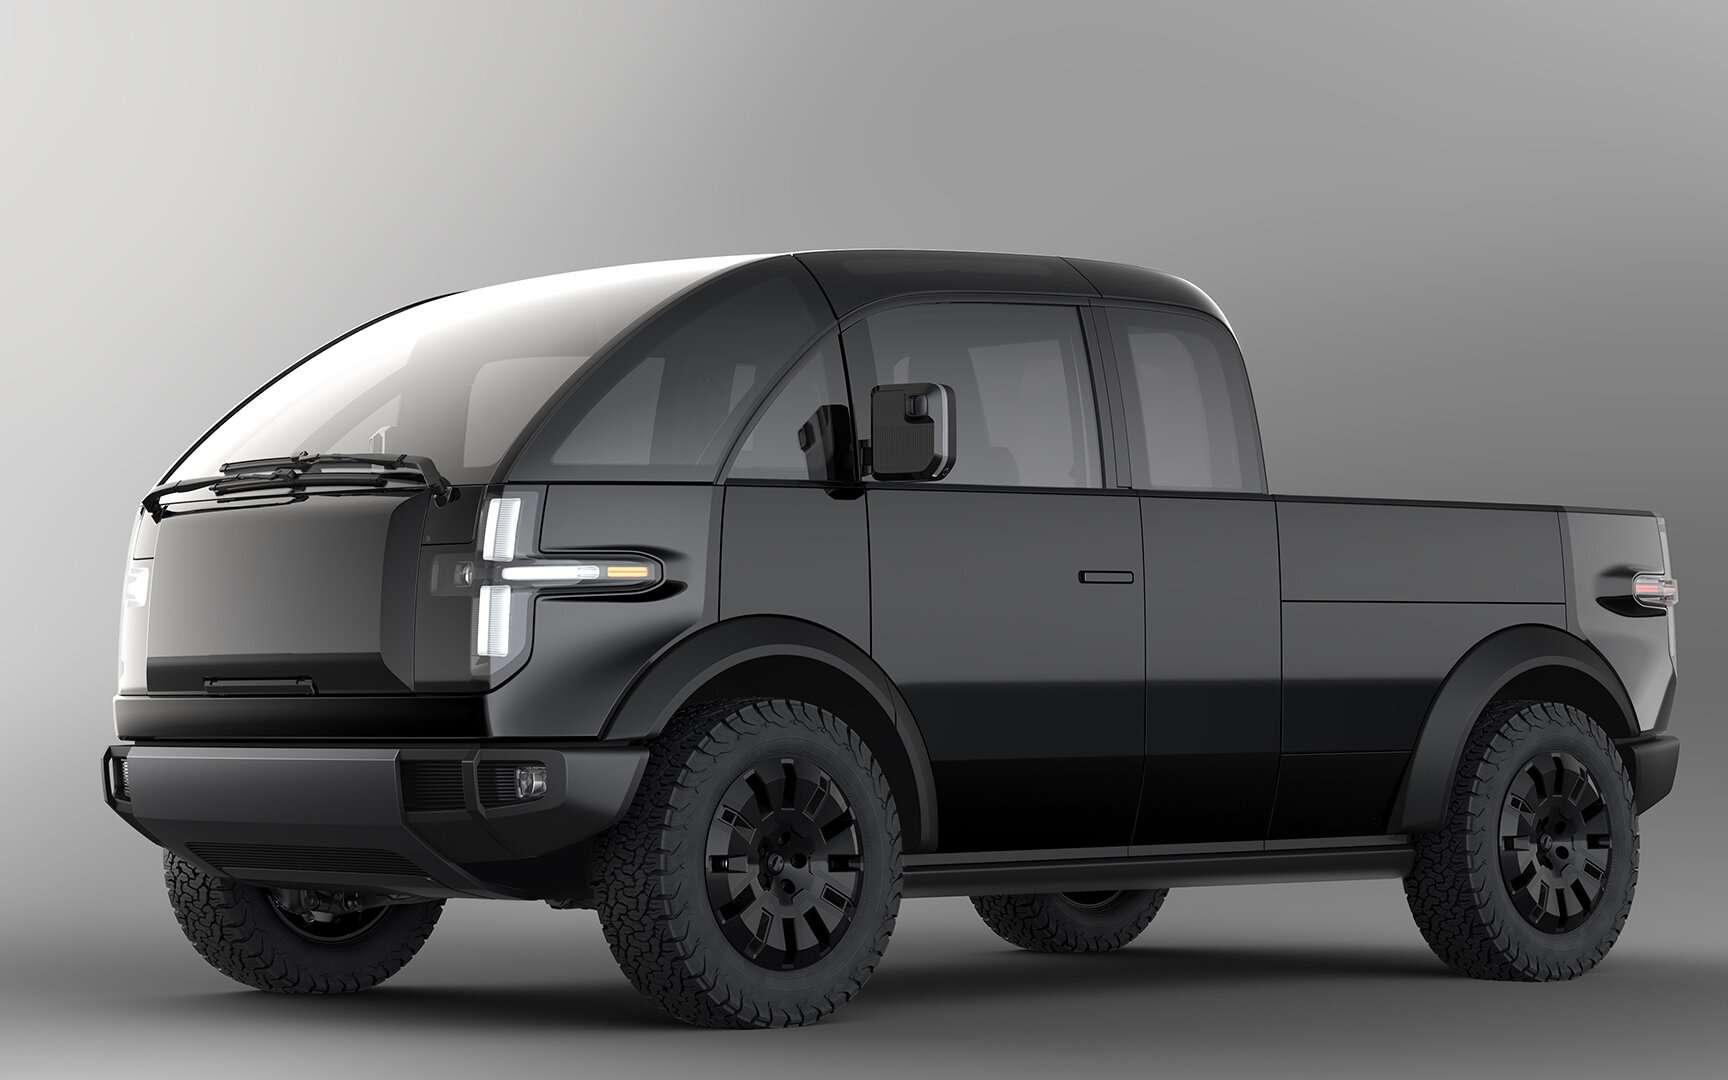 Pickup électrique : Canoo s'attaque au Tesla Cybertruck avec un design futuriste - Futura